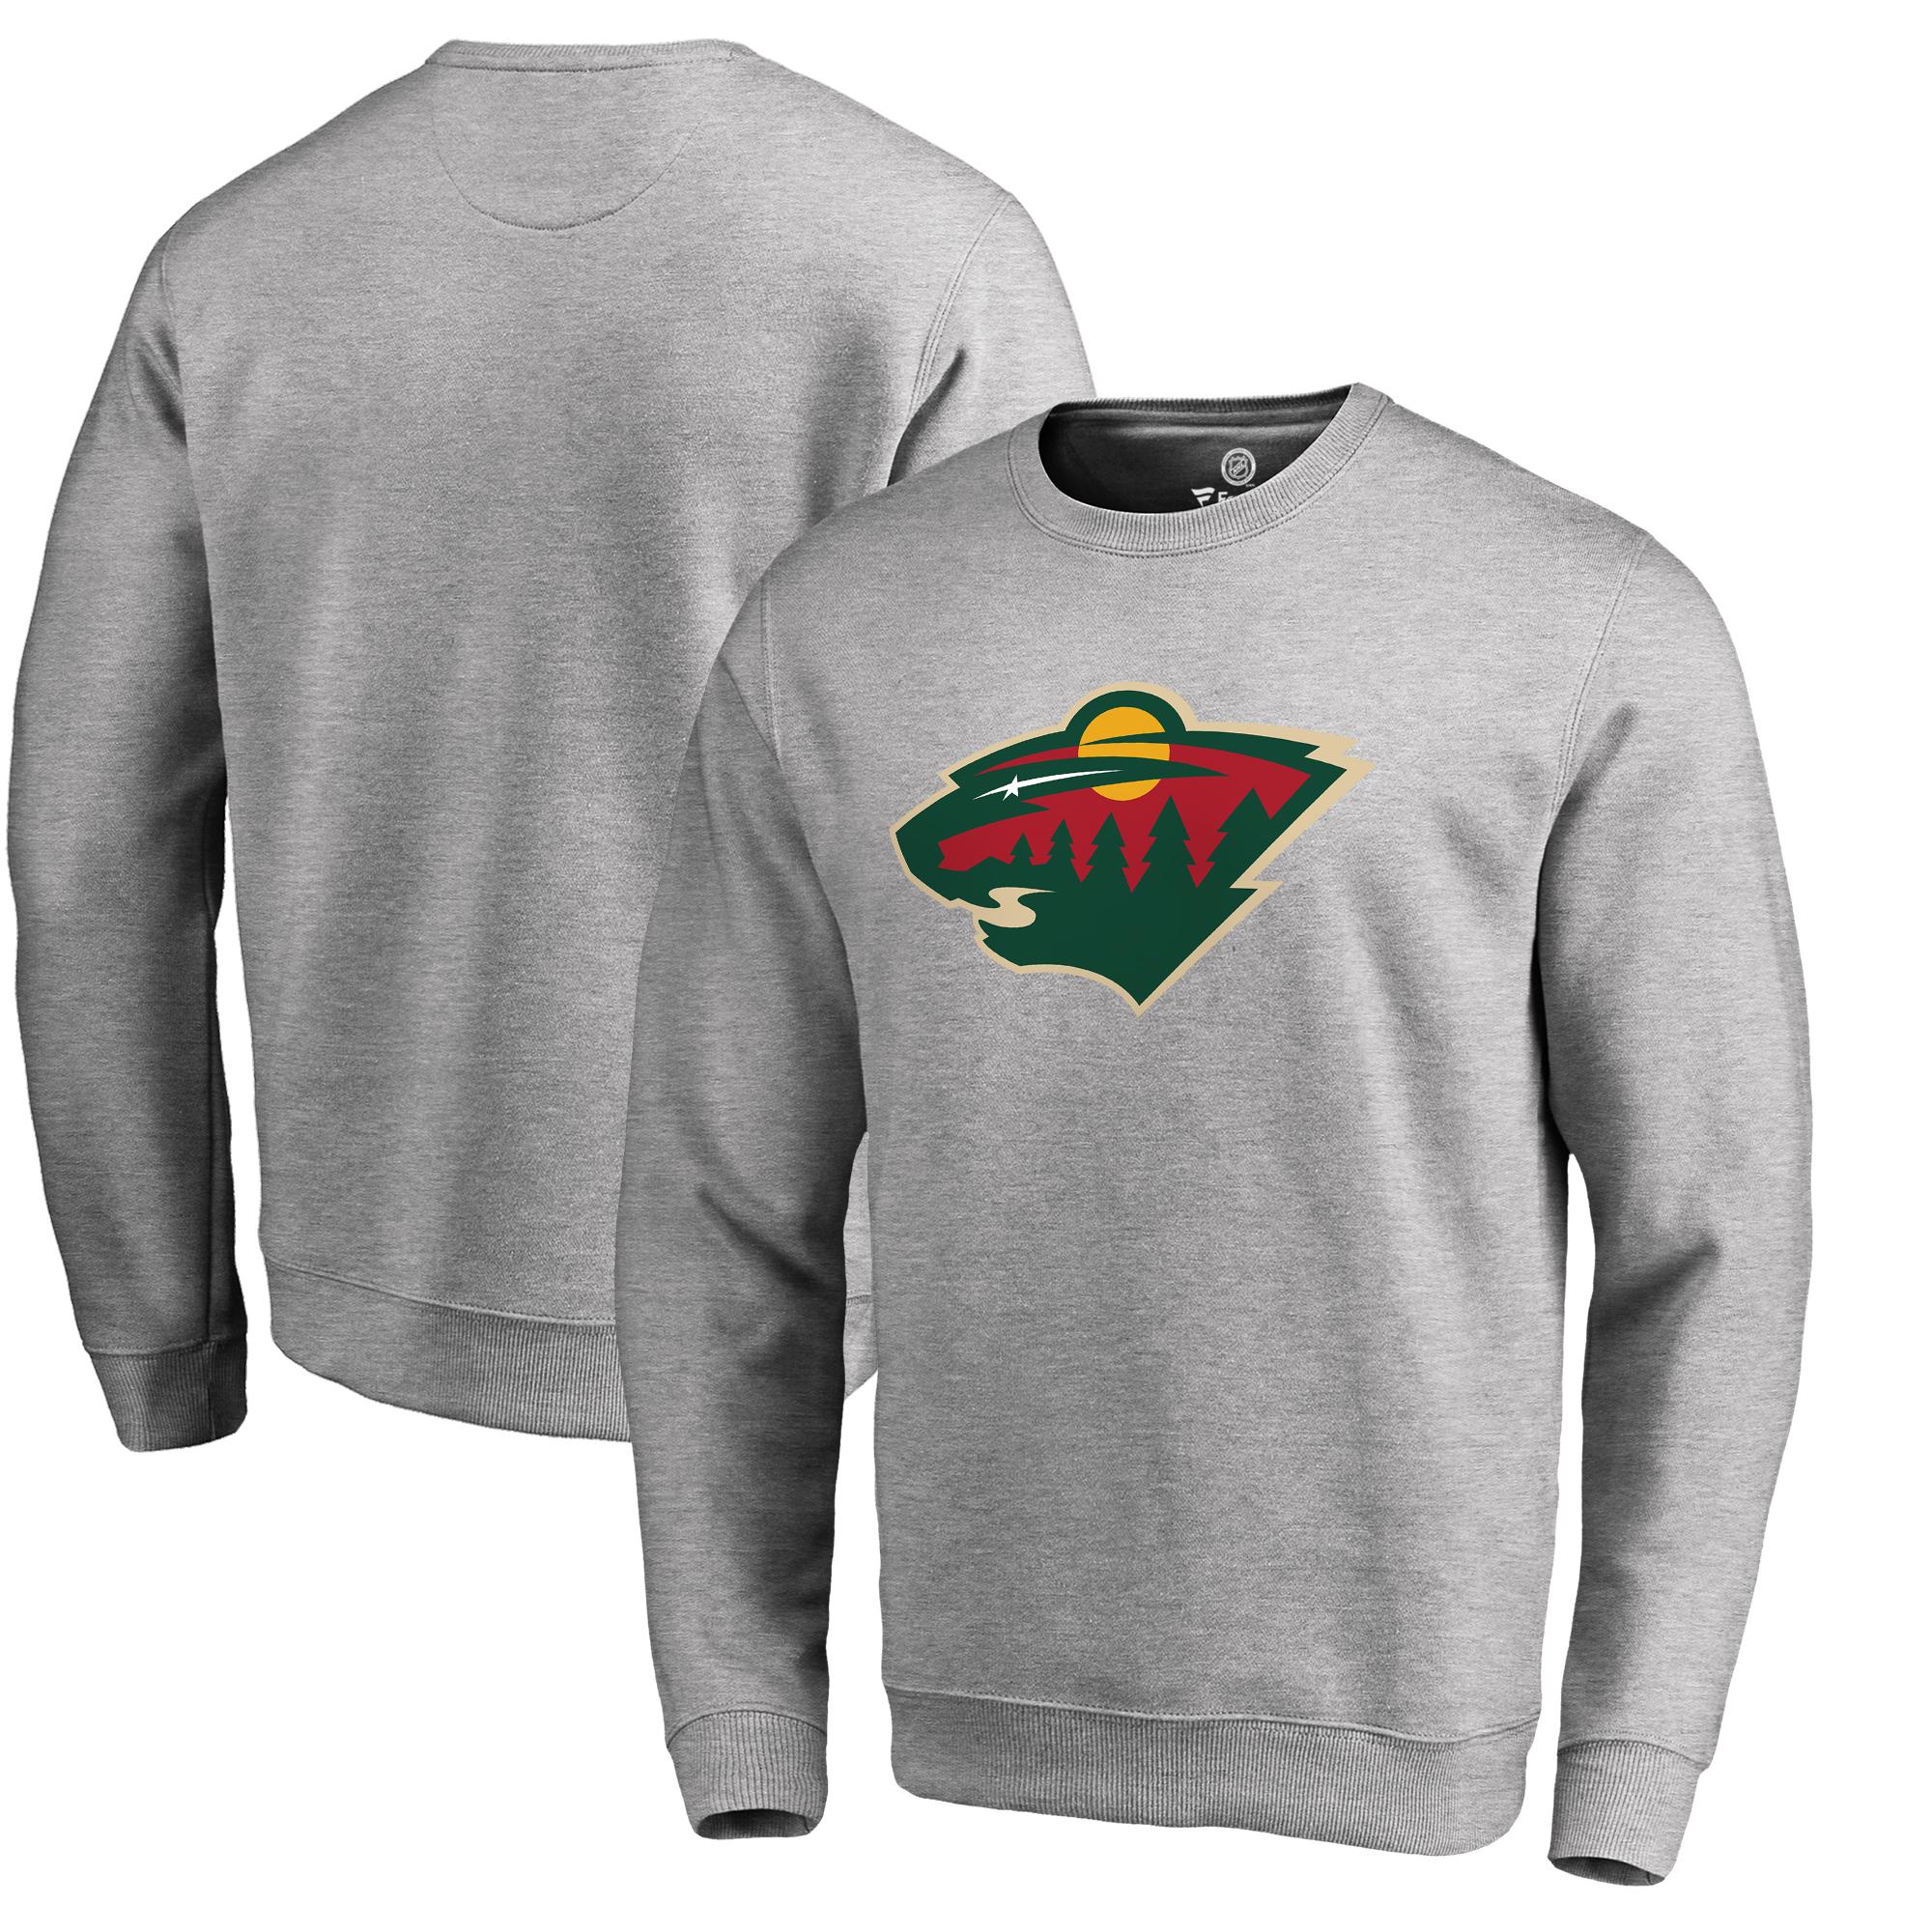 Minnesota Wild Fanatics Branded Primary Logo Pullover Sweatshirt - Ash